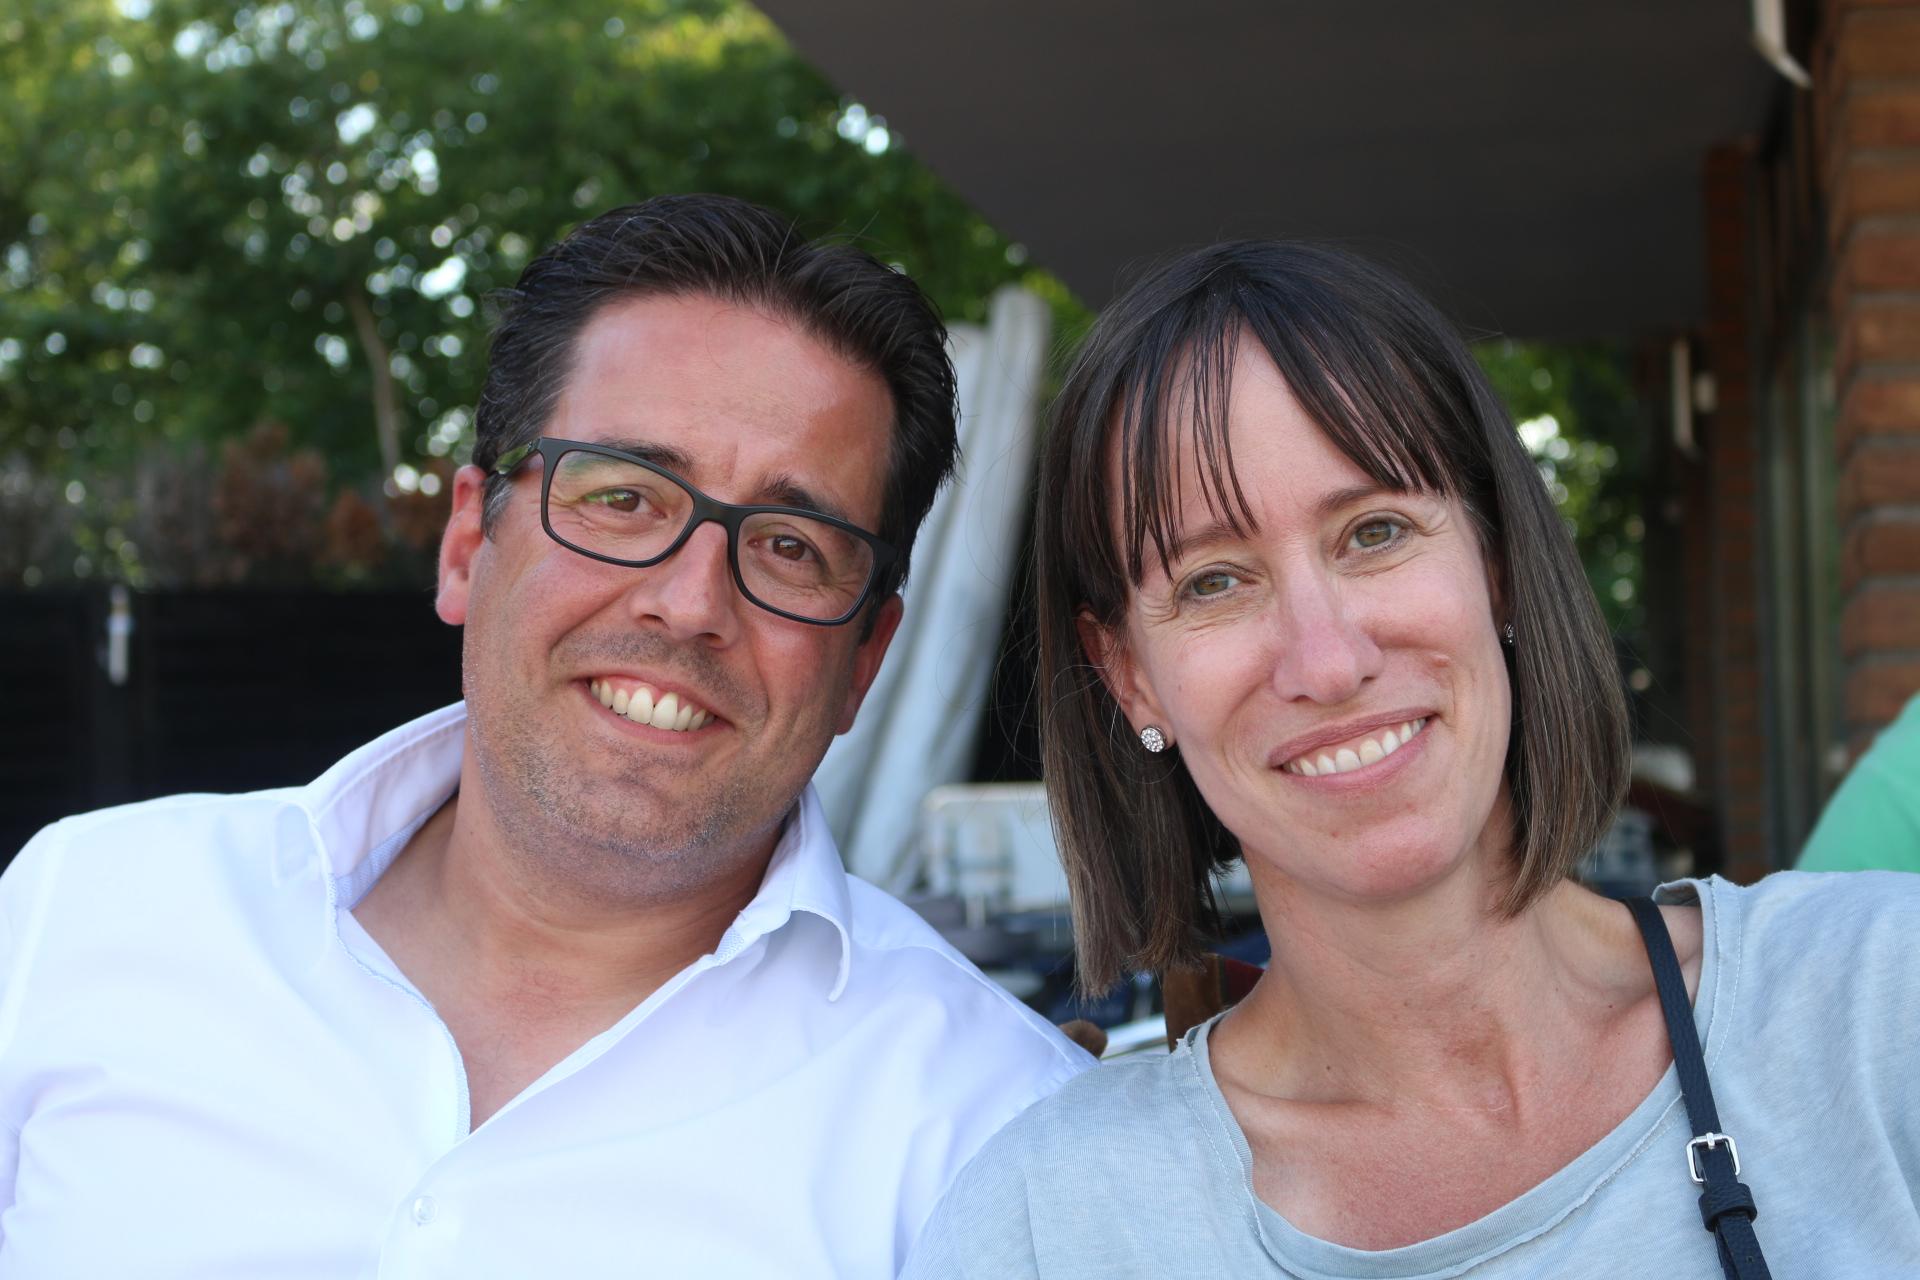 Andrea Kothe-Heugel & Philipp Heugel